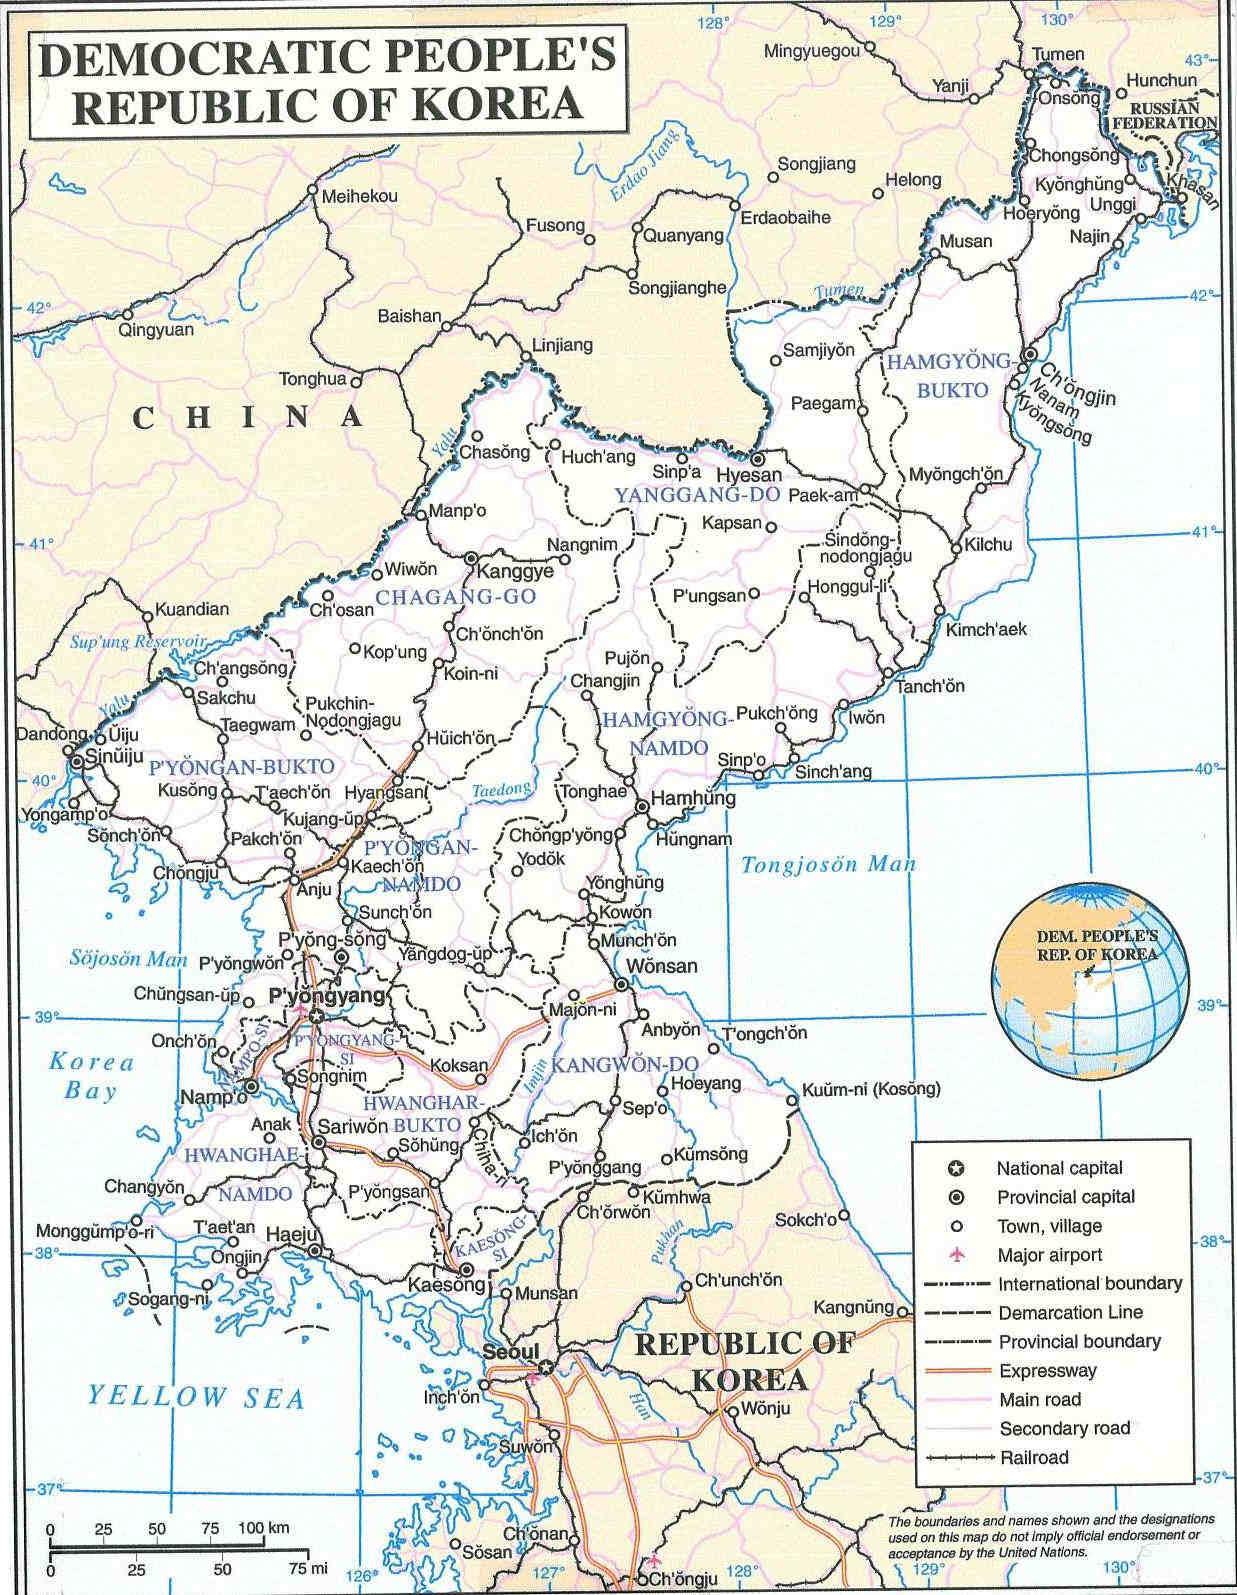 Democratic Peoples Republic of Korea Map North Korea mappery